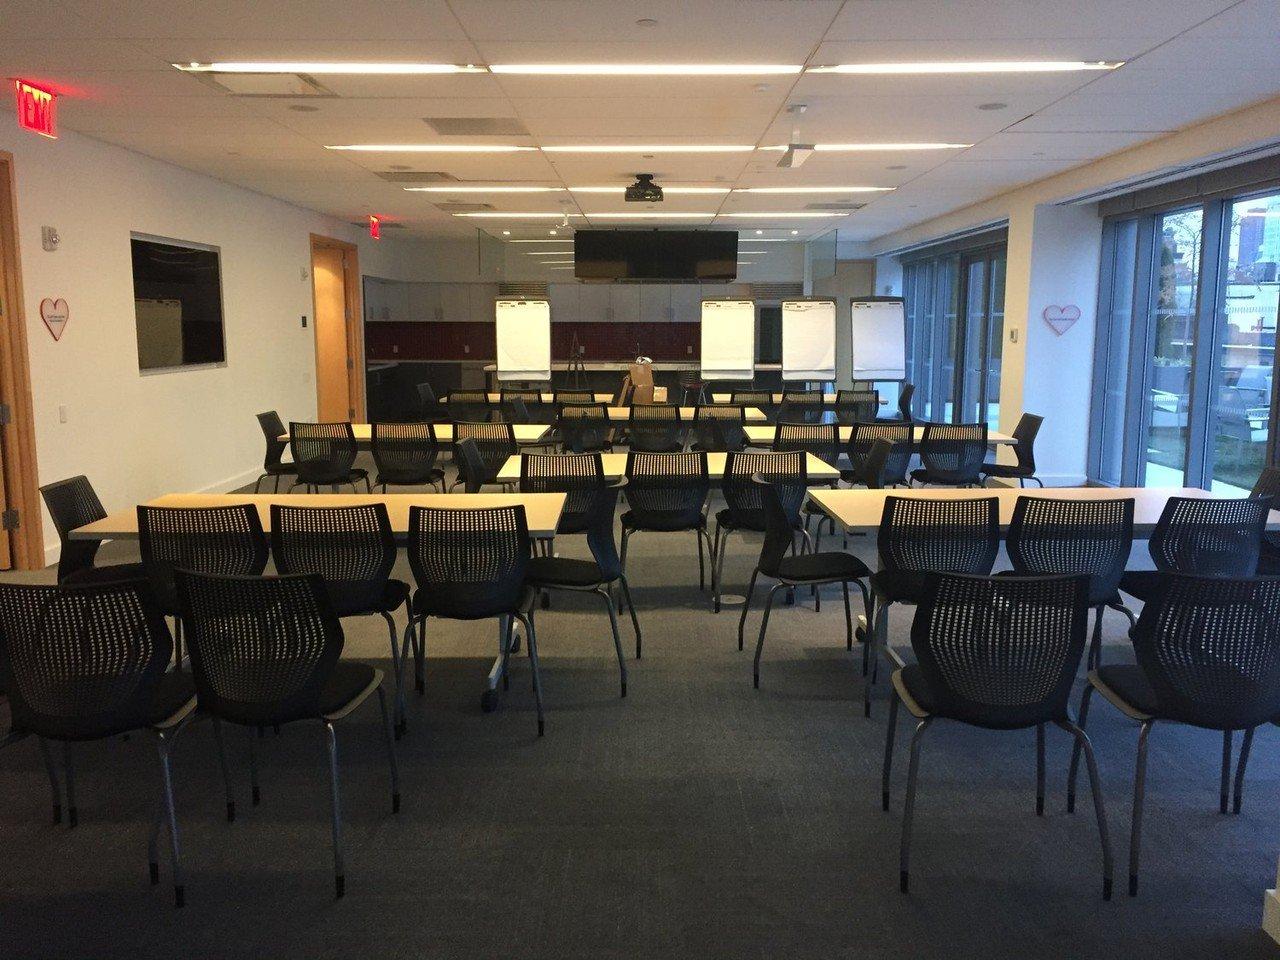 NYC workshop spaces Meetingraum God´s Love We Deliver - 5th Floor ES & T image 3